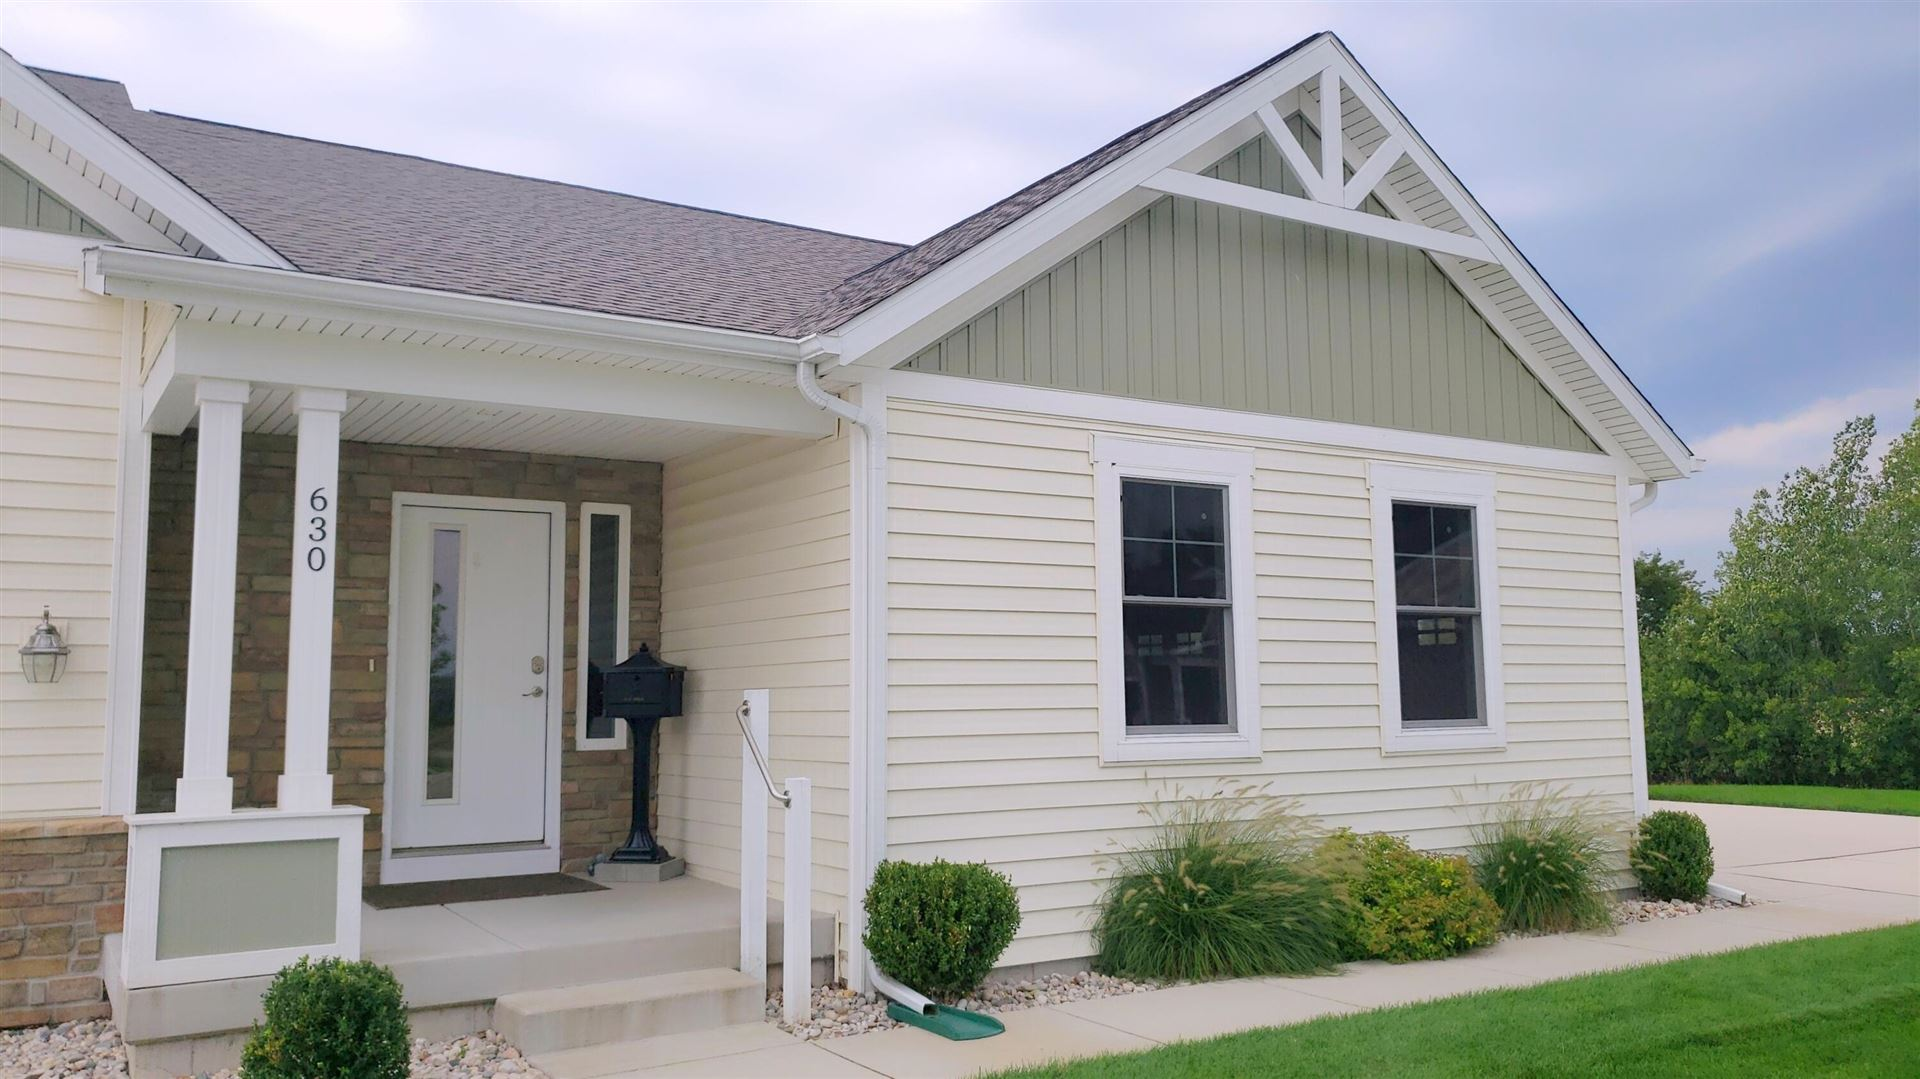 630 Norway Lane #6, Coopersville, MI 49404 - MLS#: 21104911